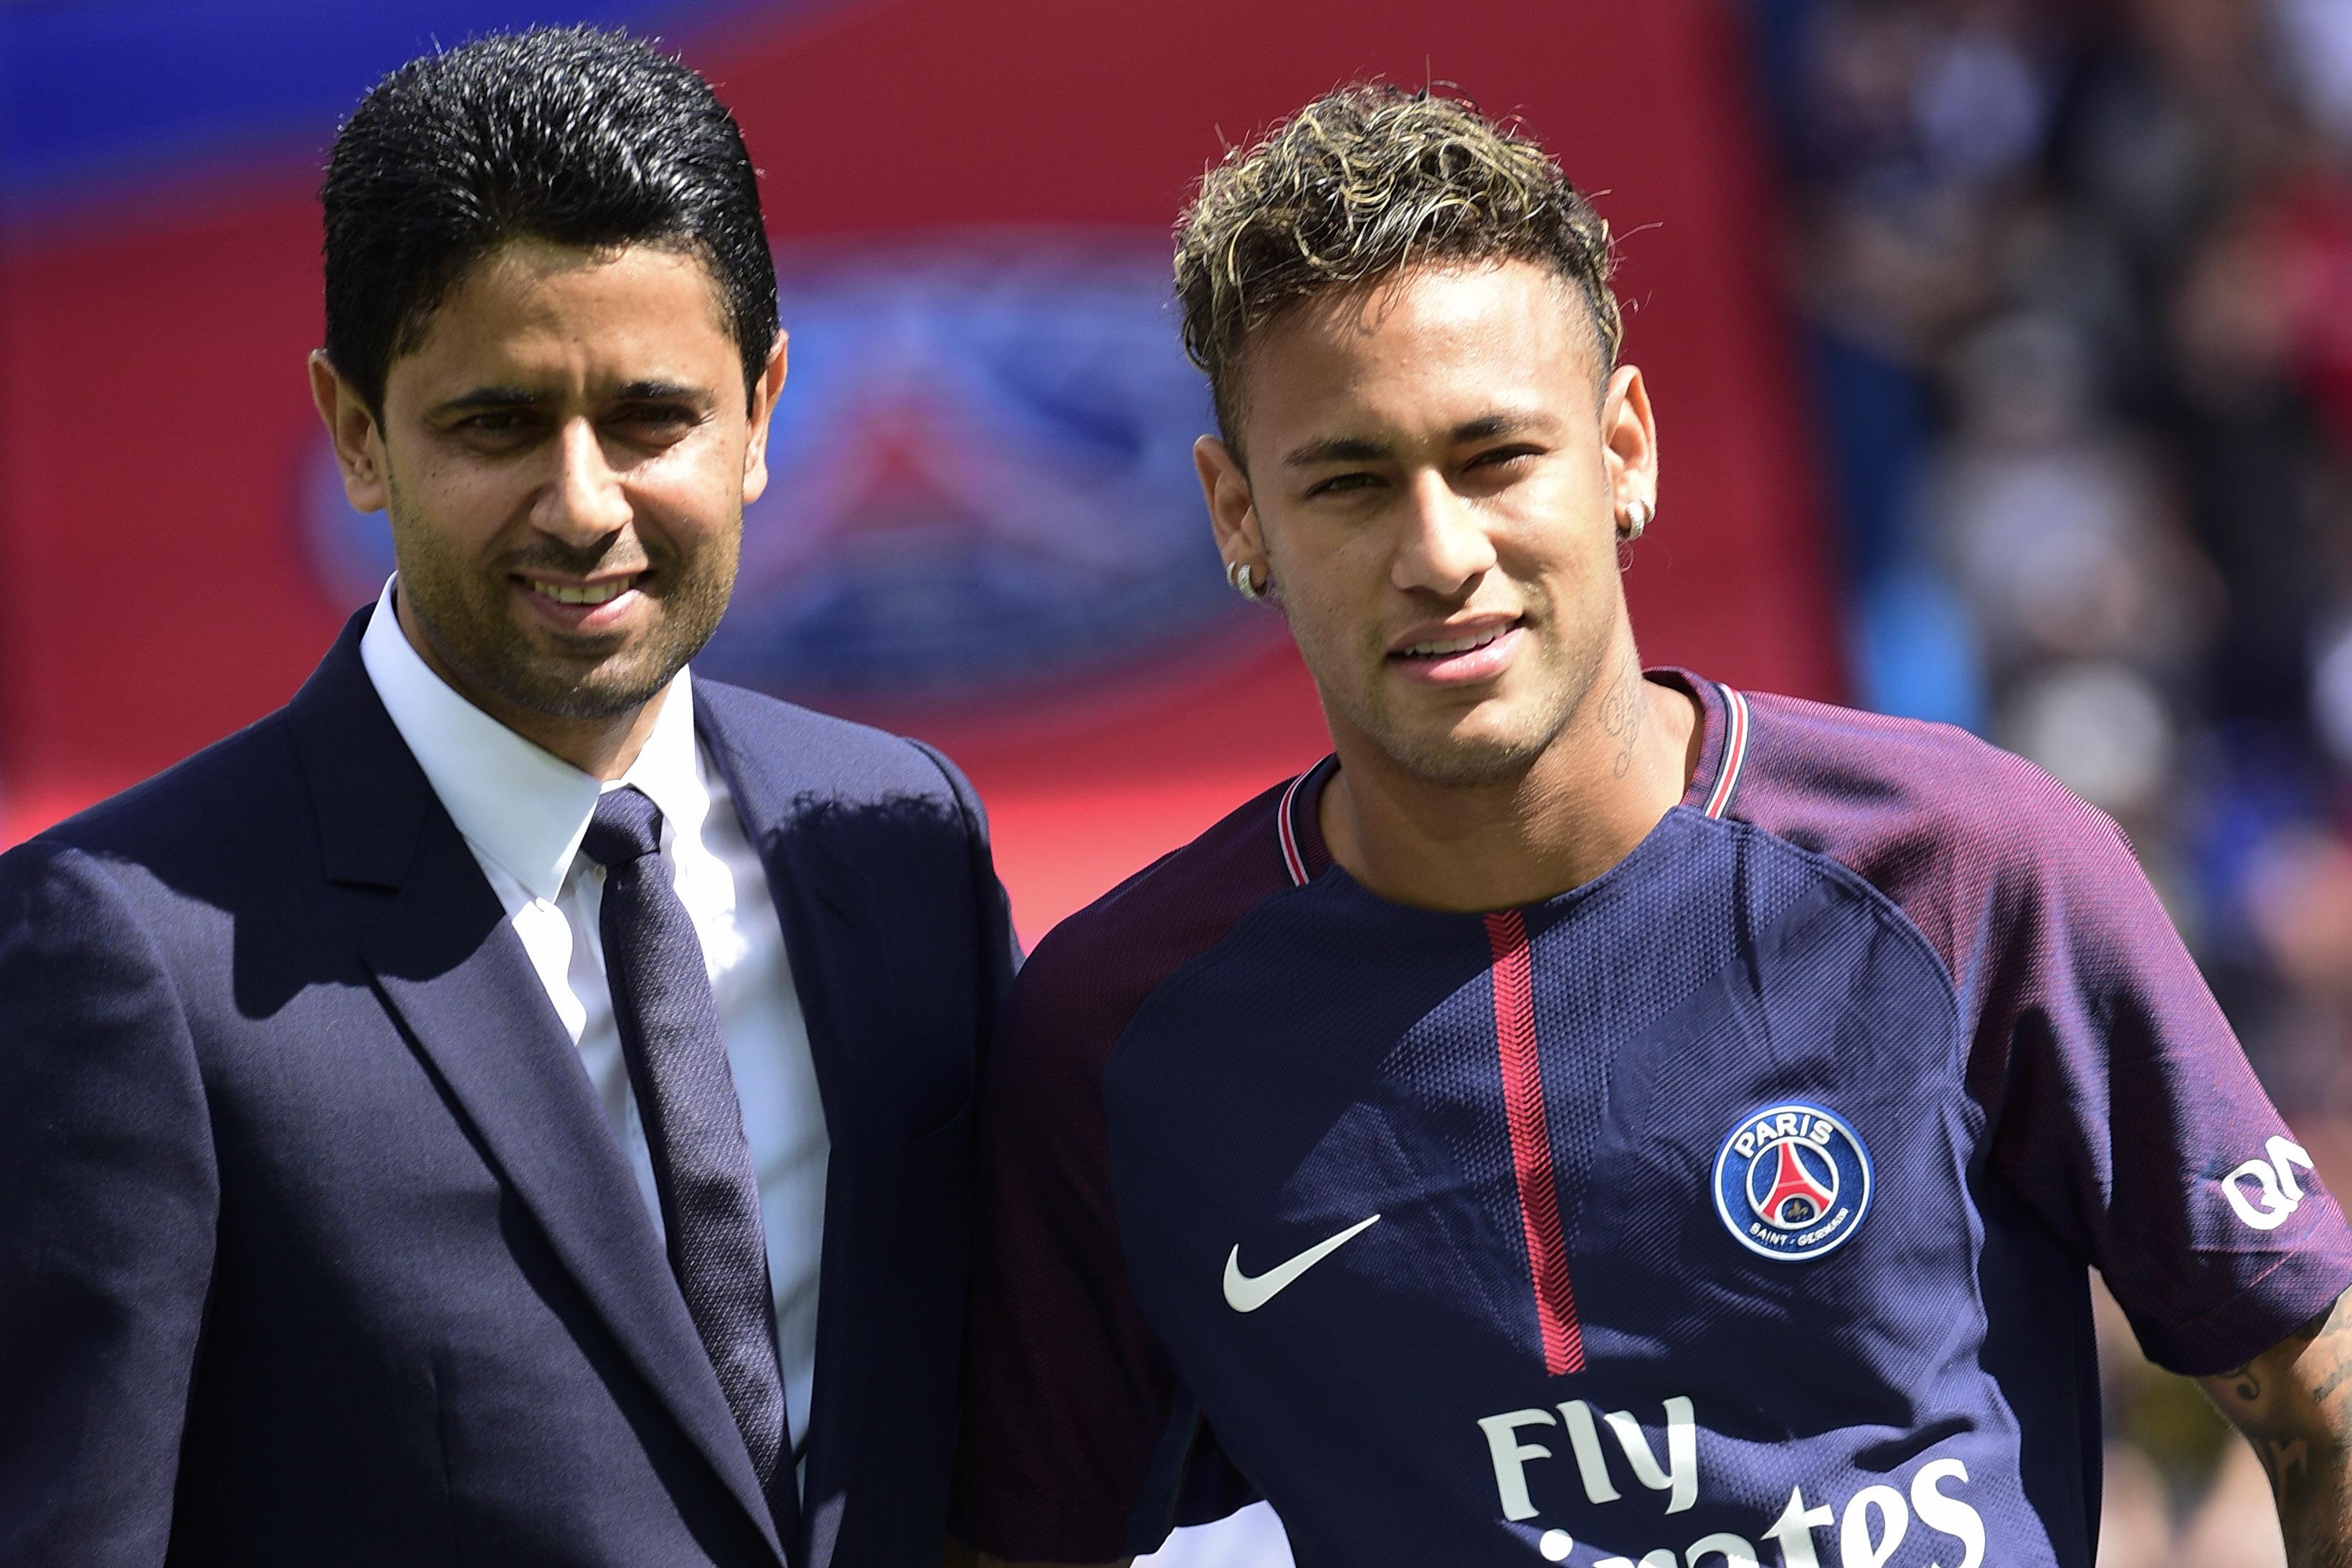 Football - Transferts - Neymar au Real Madrid l'été prochain ? «Jamais de la vie», avertit Al Khelaïfi